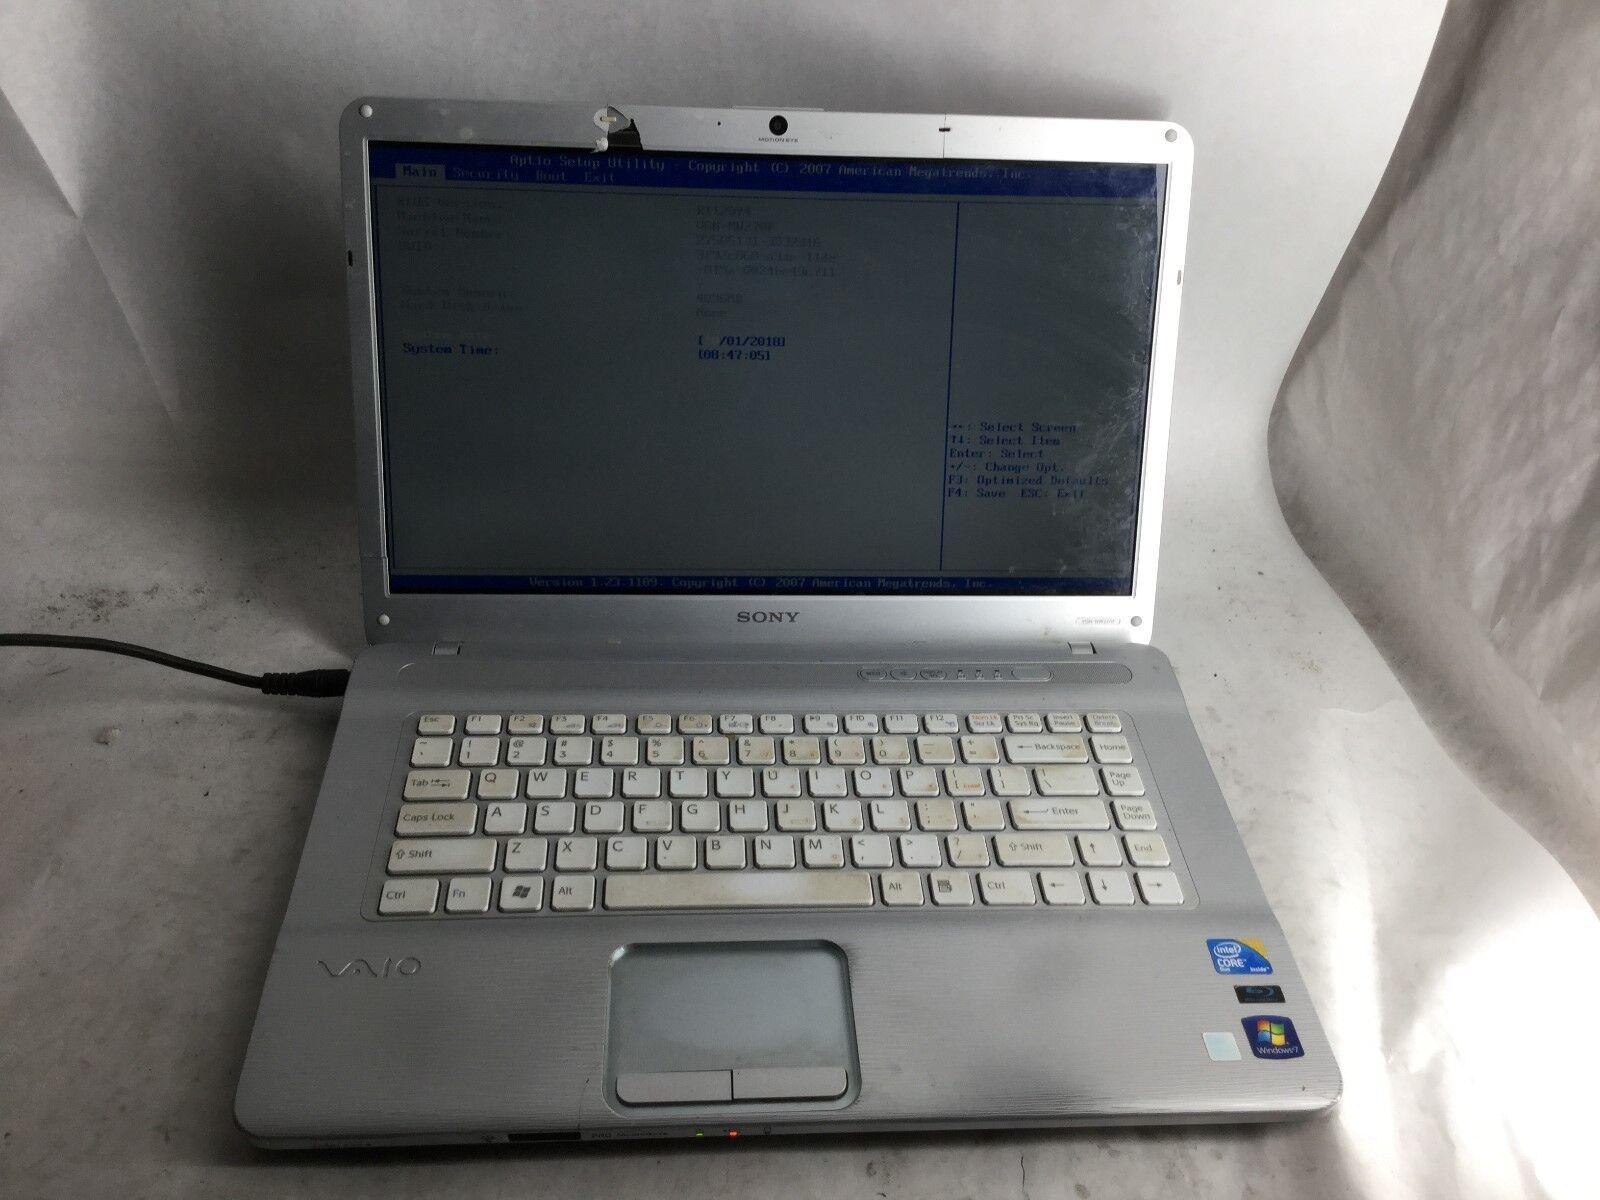 Sony VaioPCG-7184L Intel Core 2 Duo CPU 4GB RAM Laptop -CZ